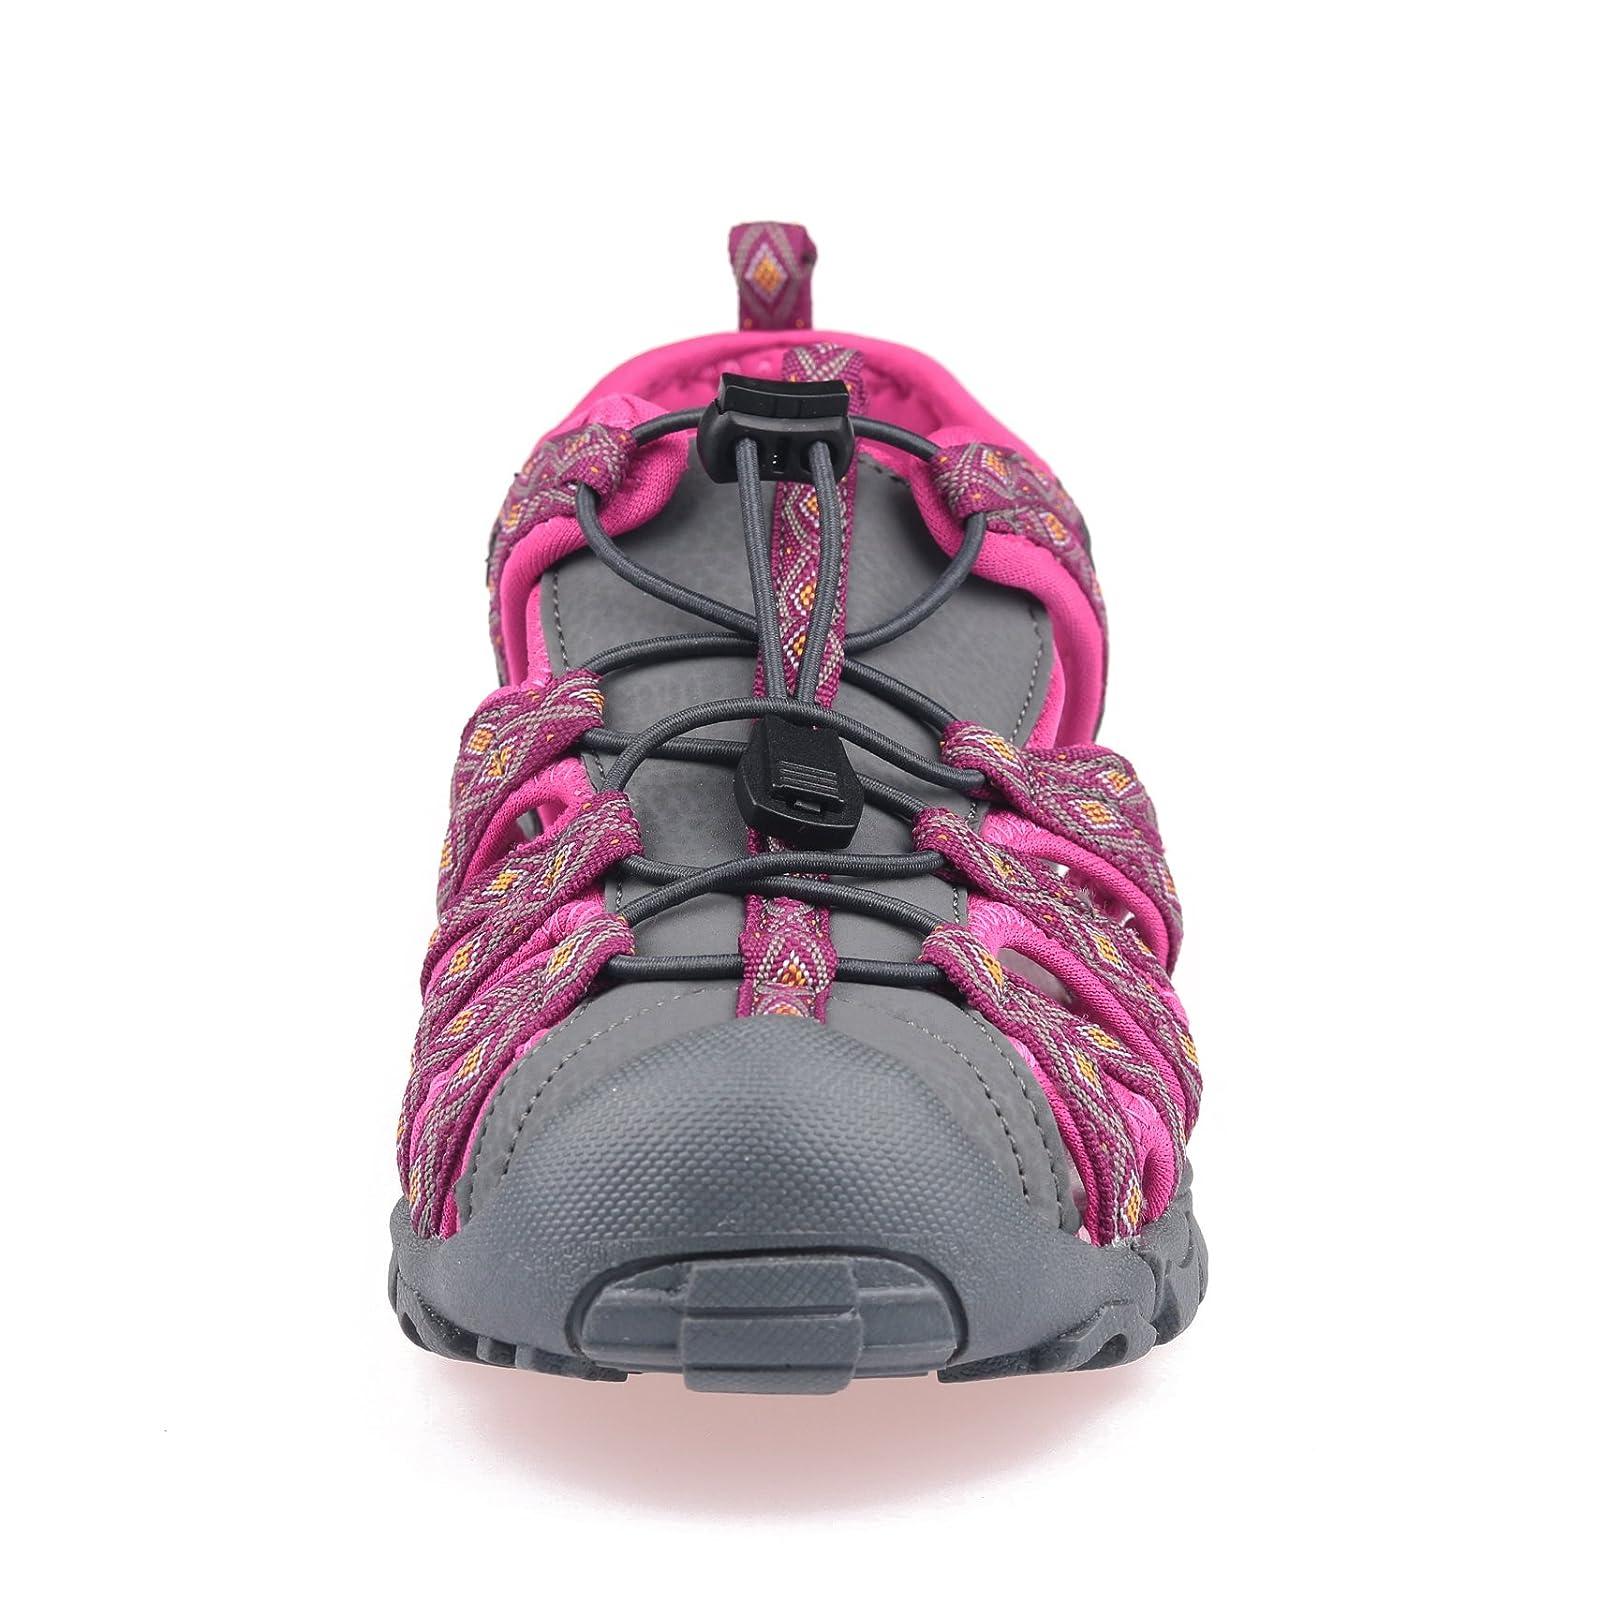 GRITION Women Outdoor Summer Sandals Adjustable Closed - 2